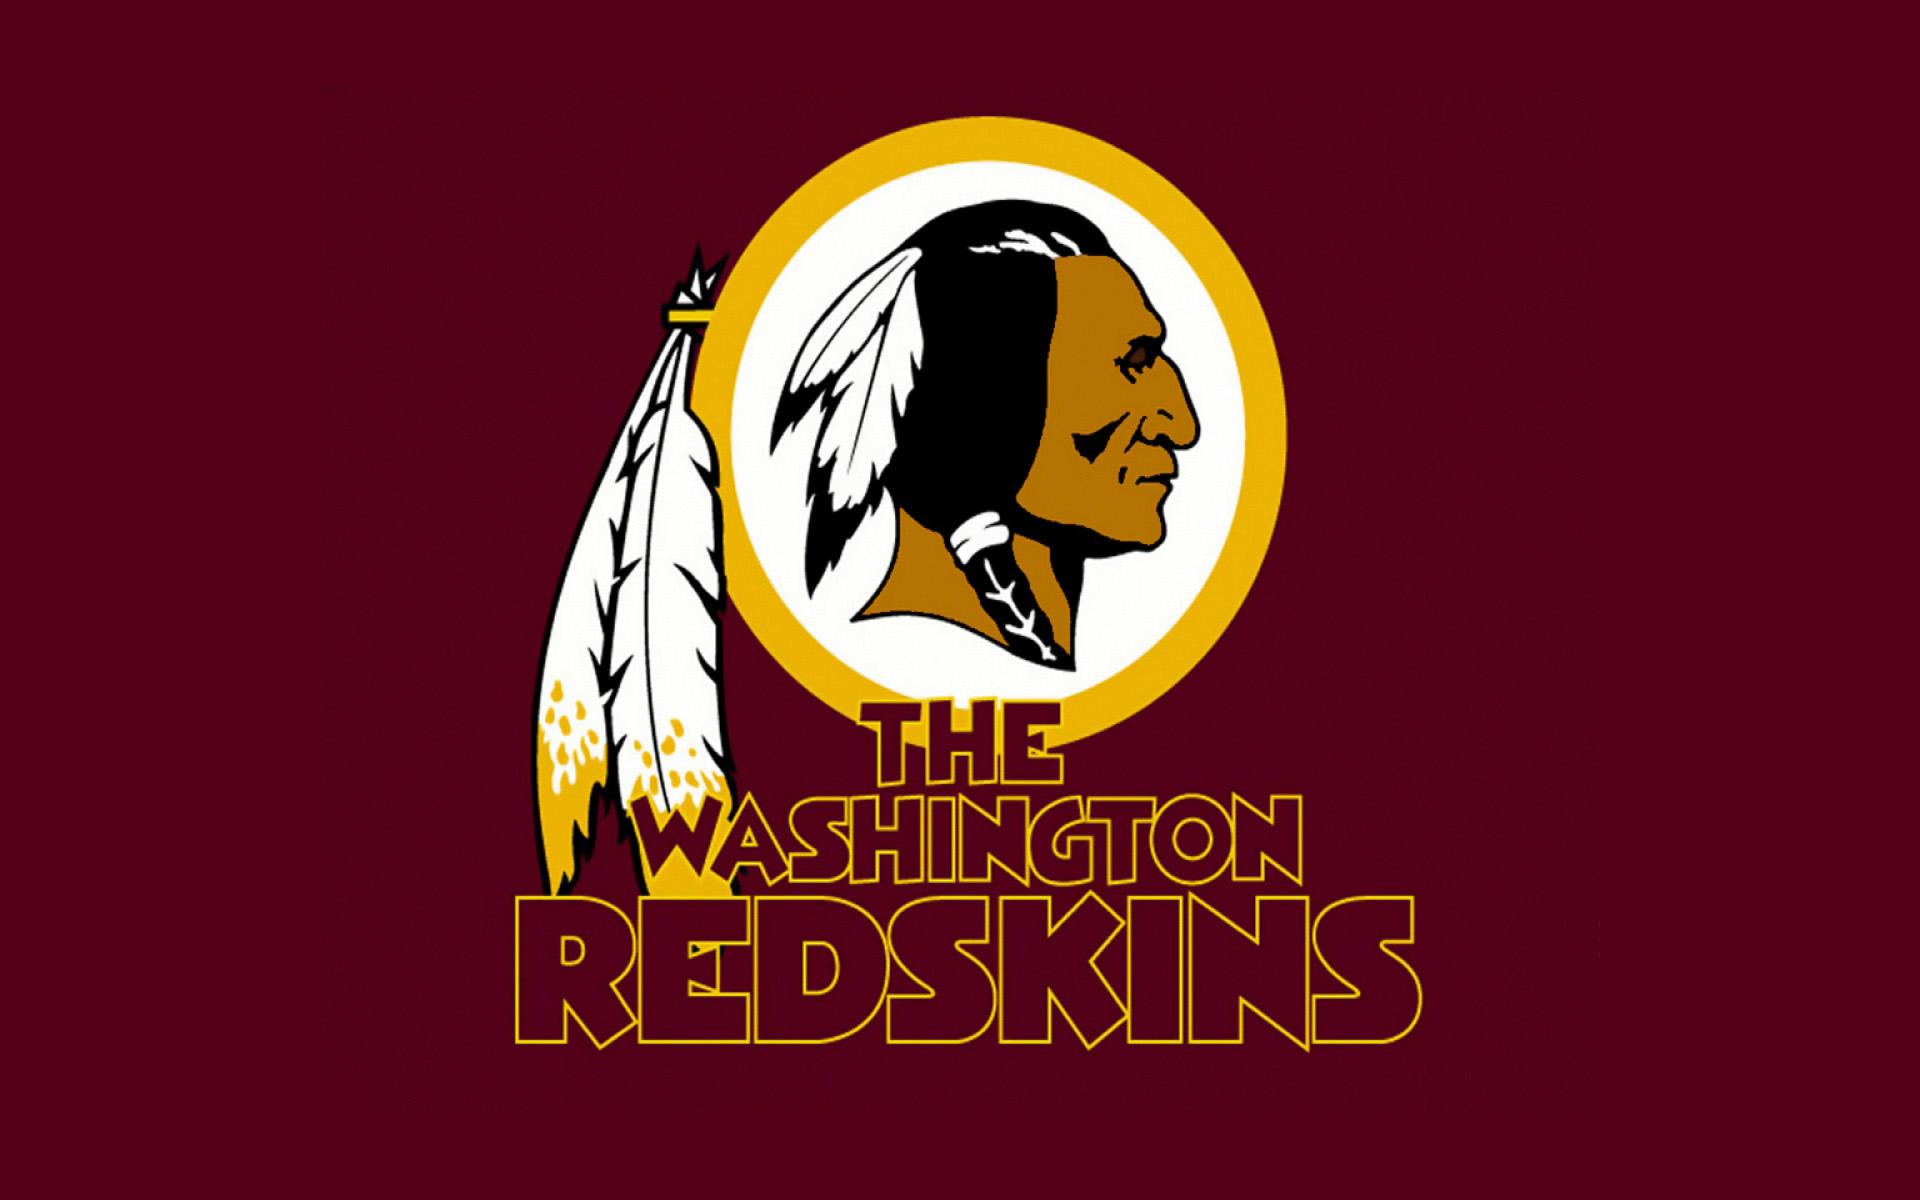 washington redskins desktops dark logo 1920x1200 1920x1200